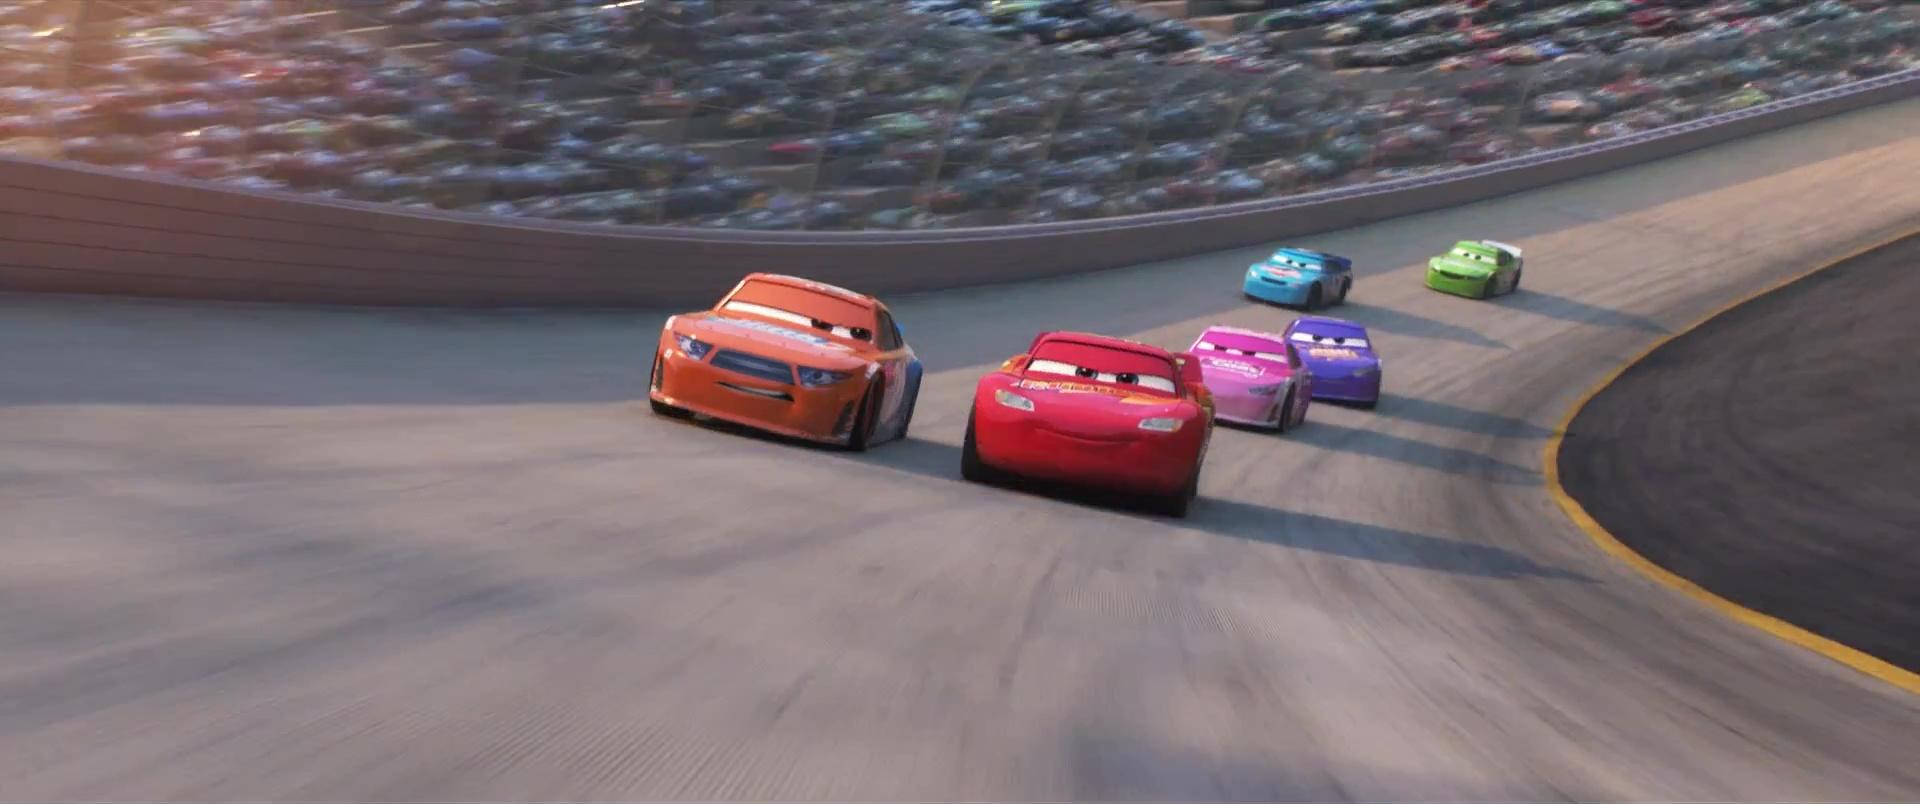 speedy comet personnage character disney pixar cars 3